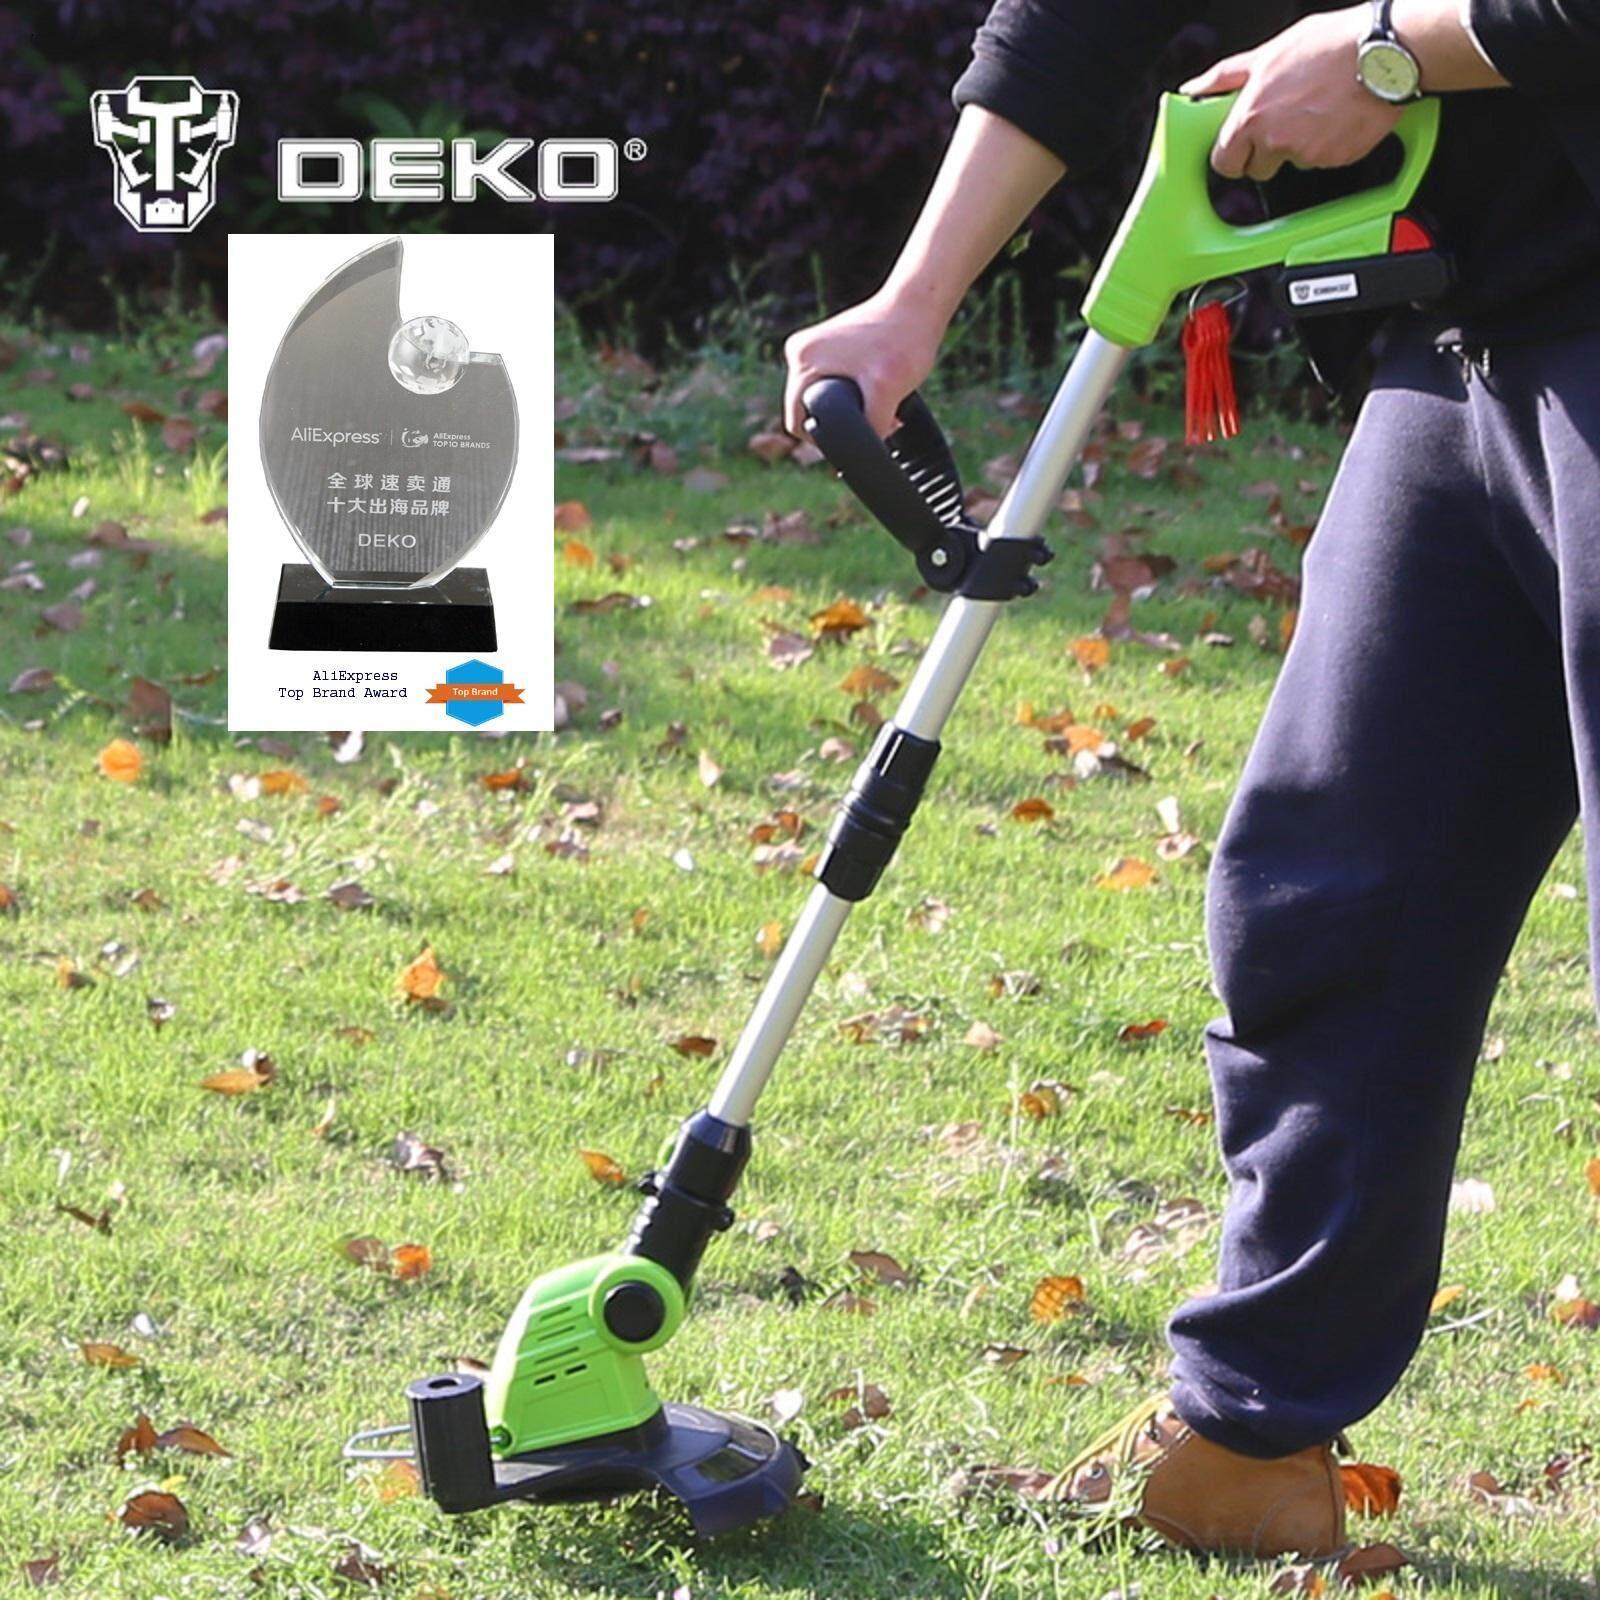 Deko เครื่องตัดหญ้าไร้สาย 20v Lithium Battery Cordless Grass Cutter Trimmer.